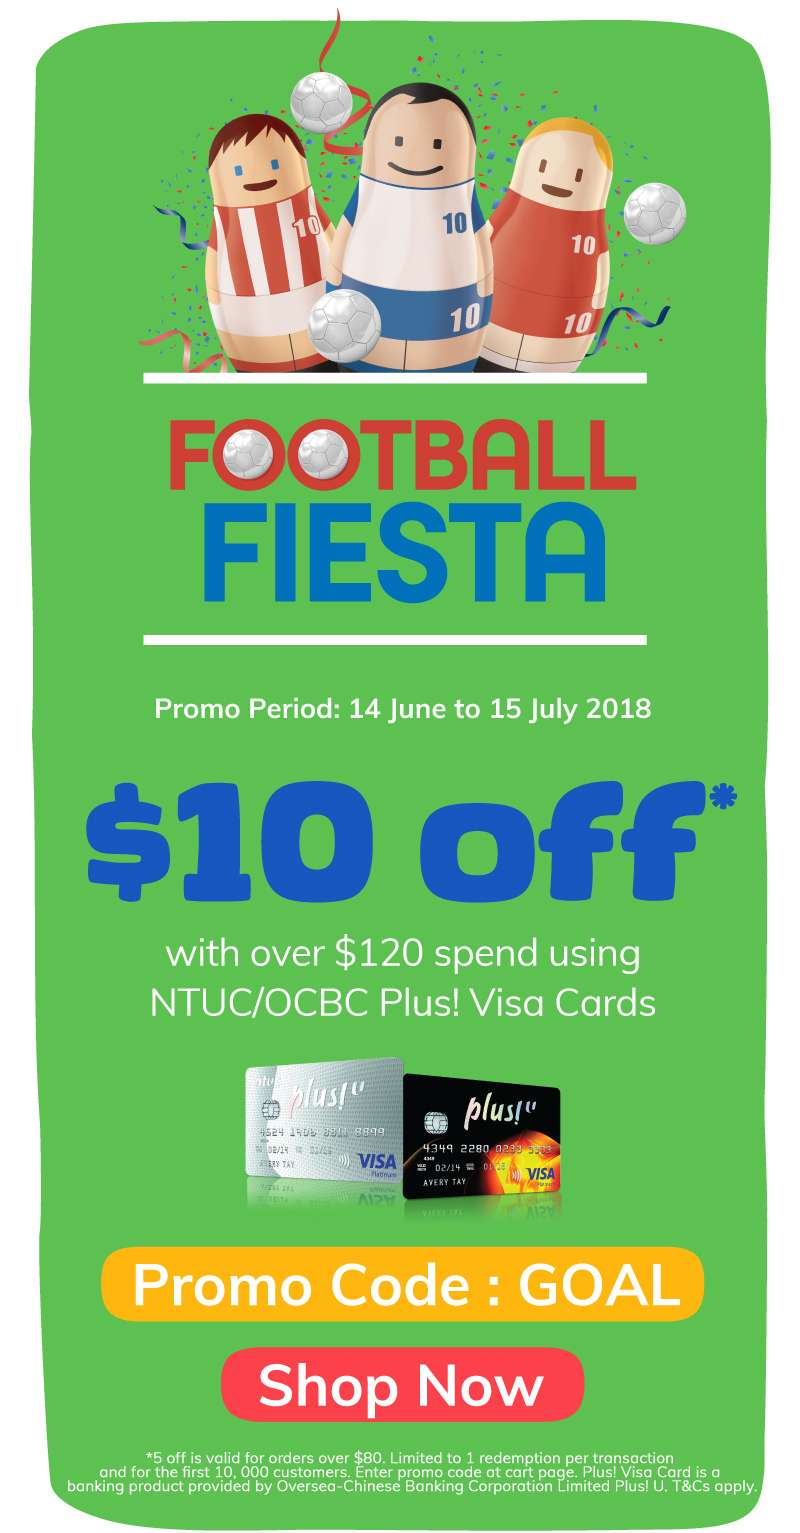 $10 off over $120 using NTUC/ OCBC Plus! Visa Cards